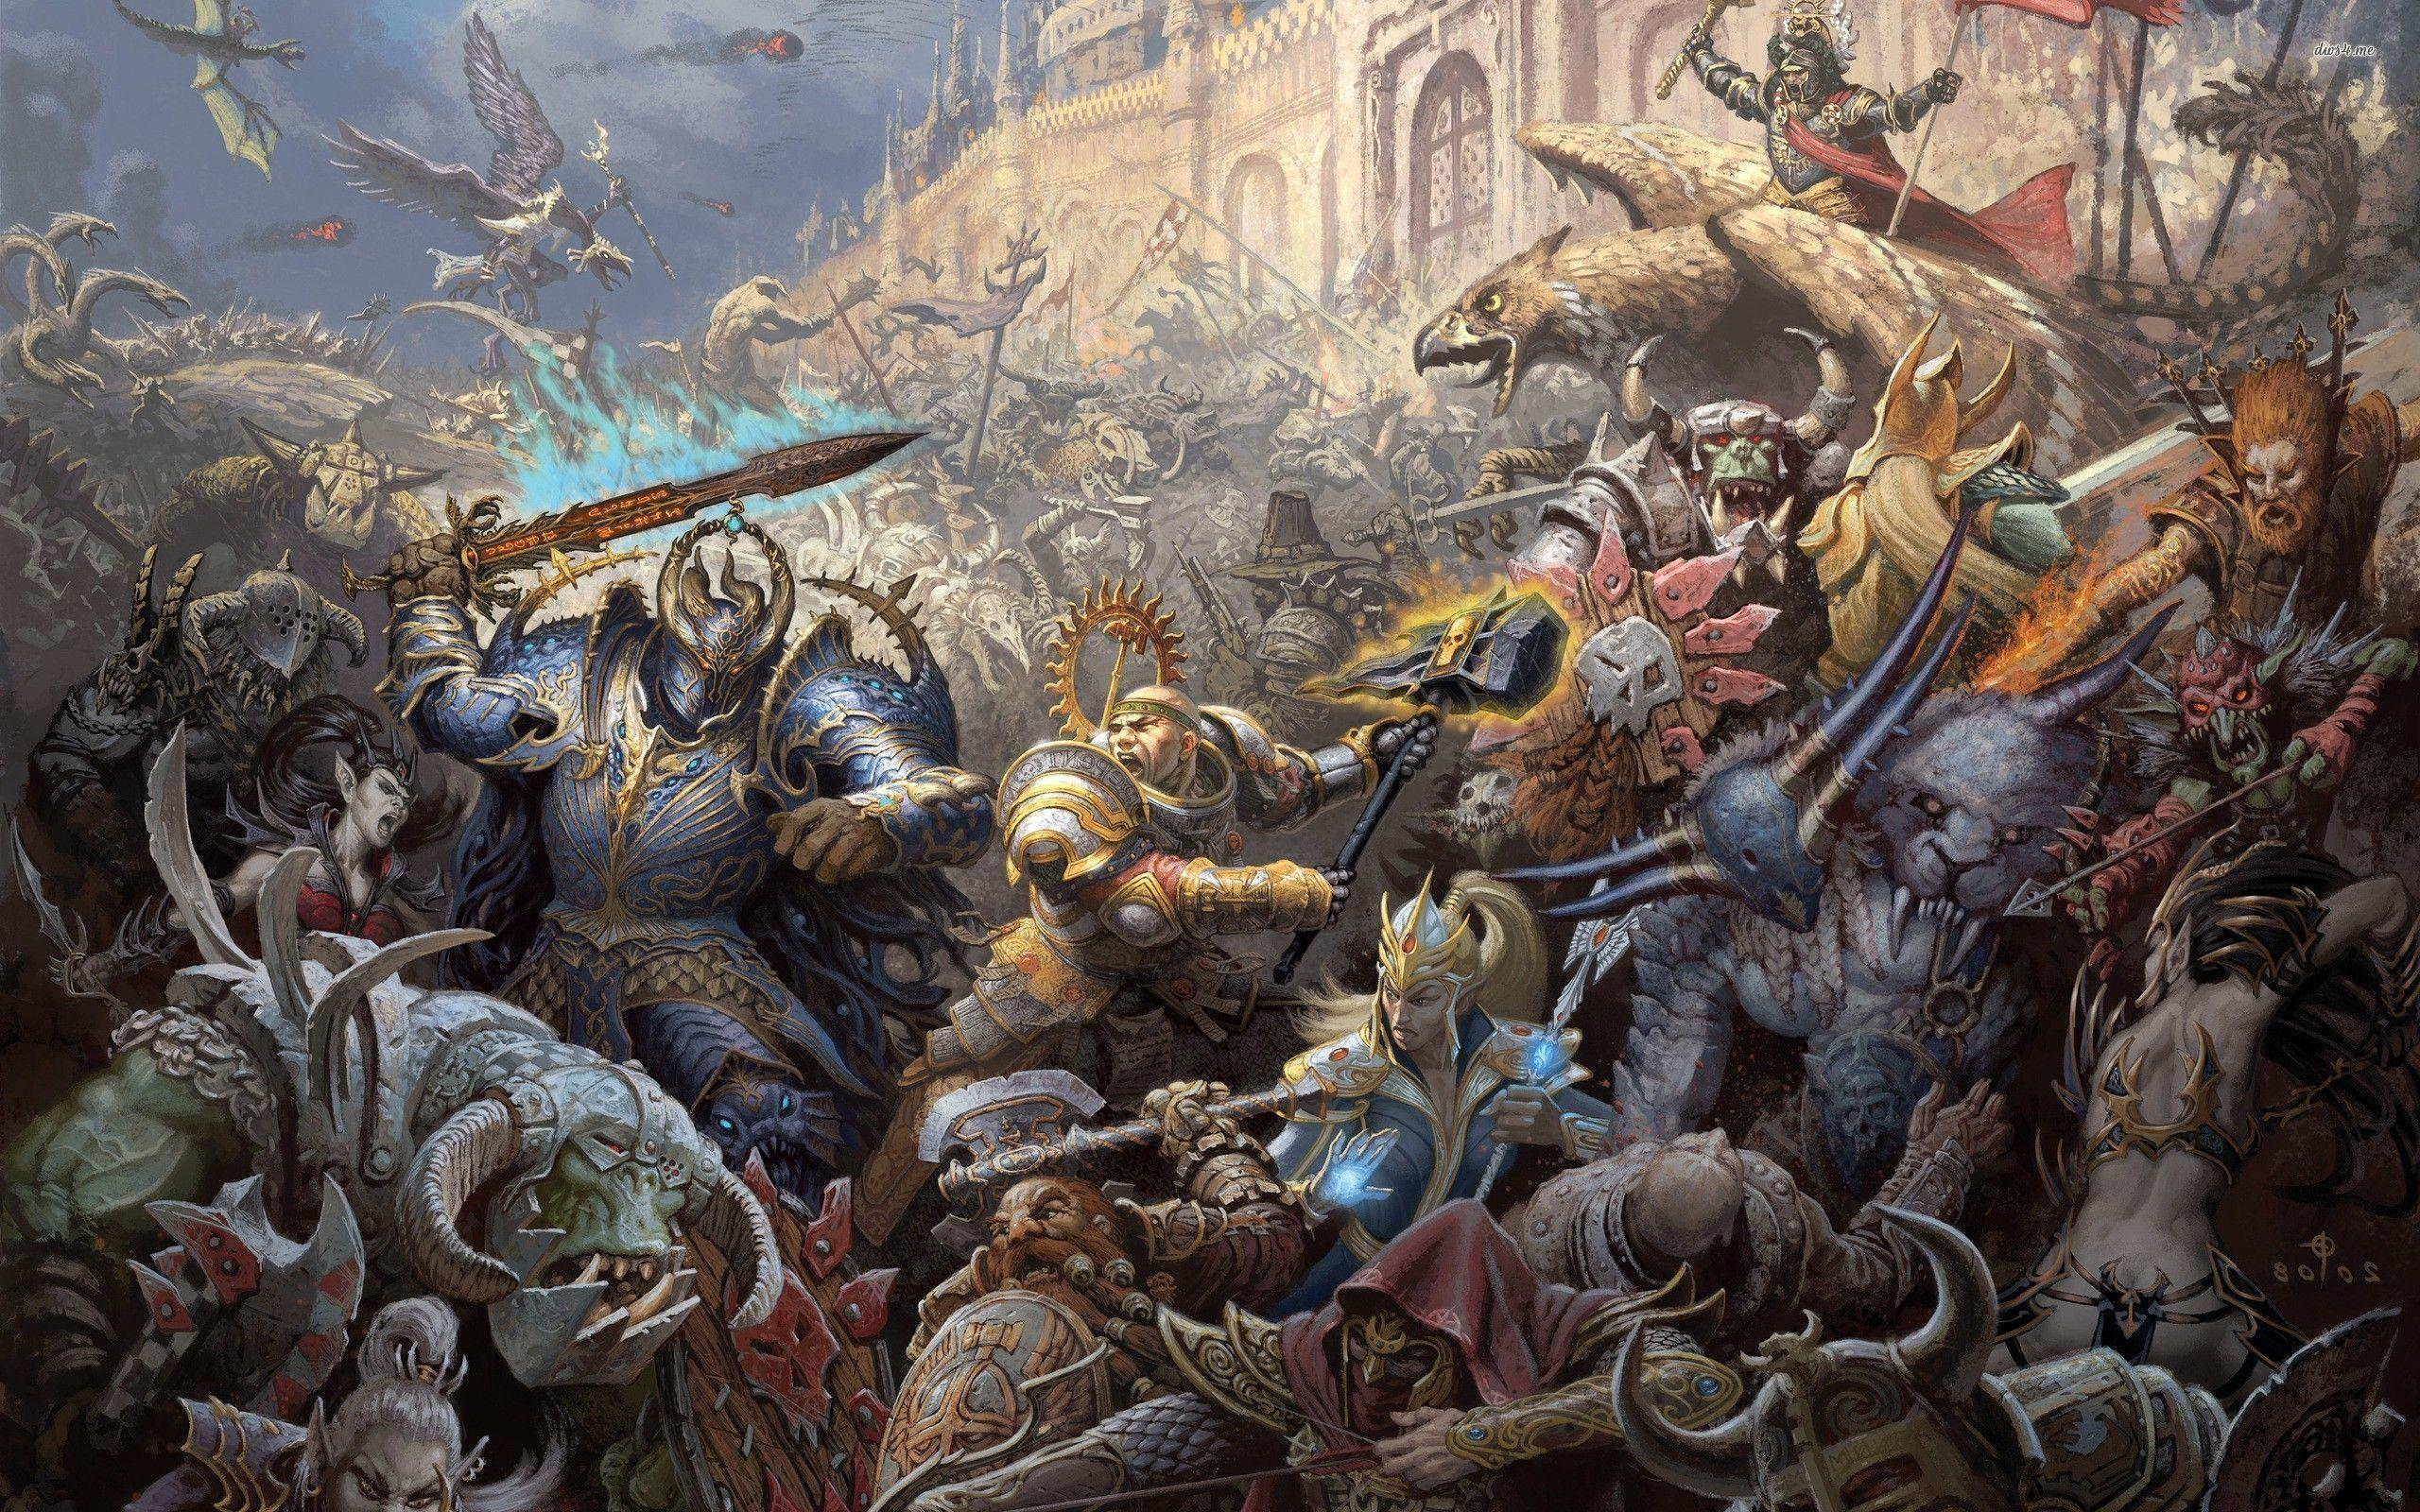 Warhammer Fantasy Wallpapers Wallpaper Cave